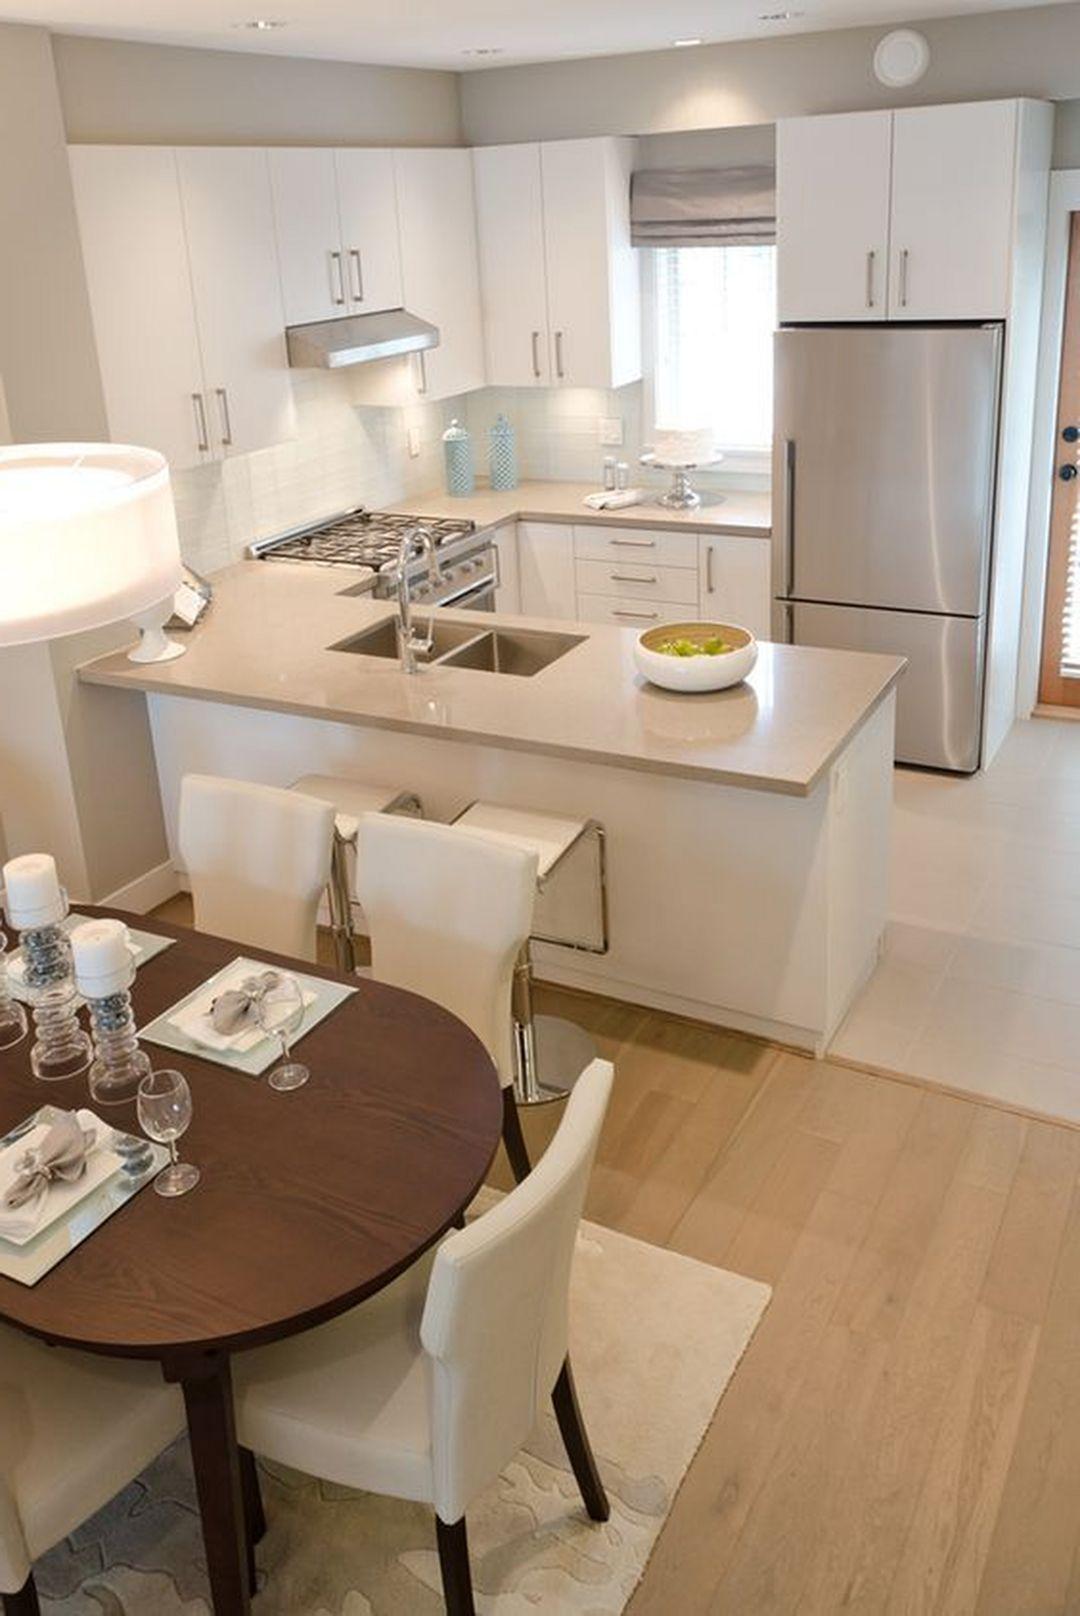 best 15 amazing small modern kitchen design ideas small modern kitchens small apartment on kitchen decor themes modern id=47782